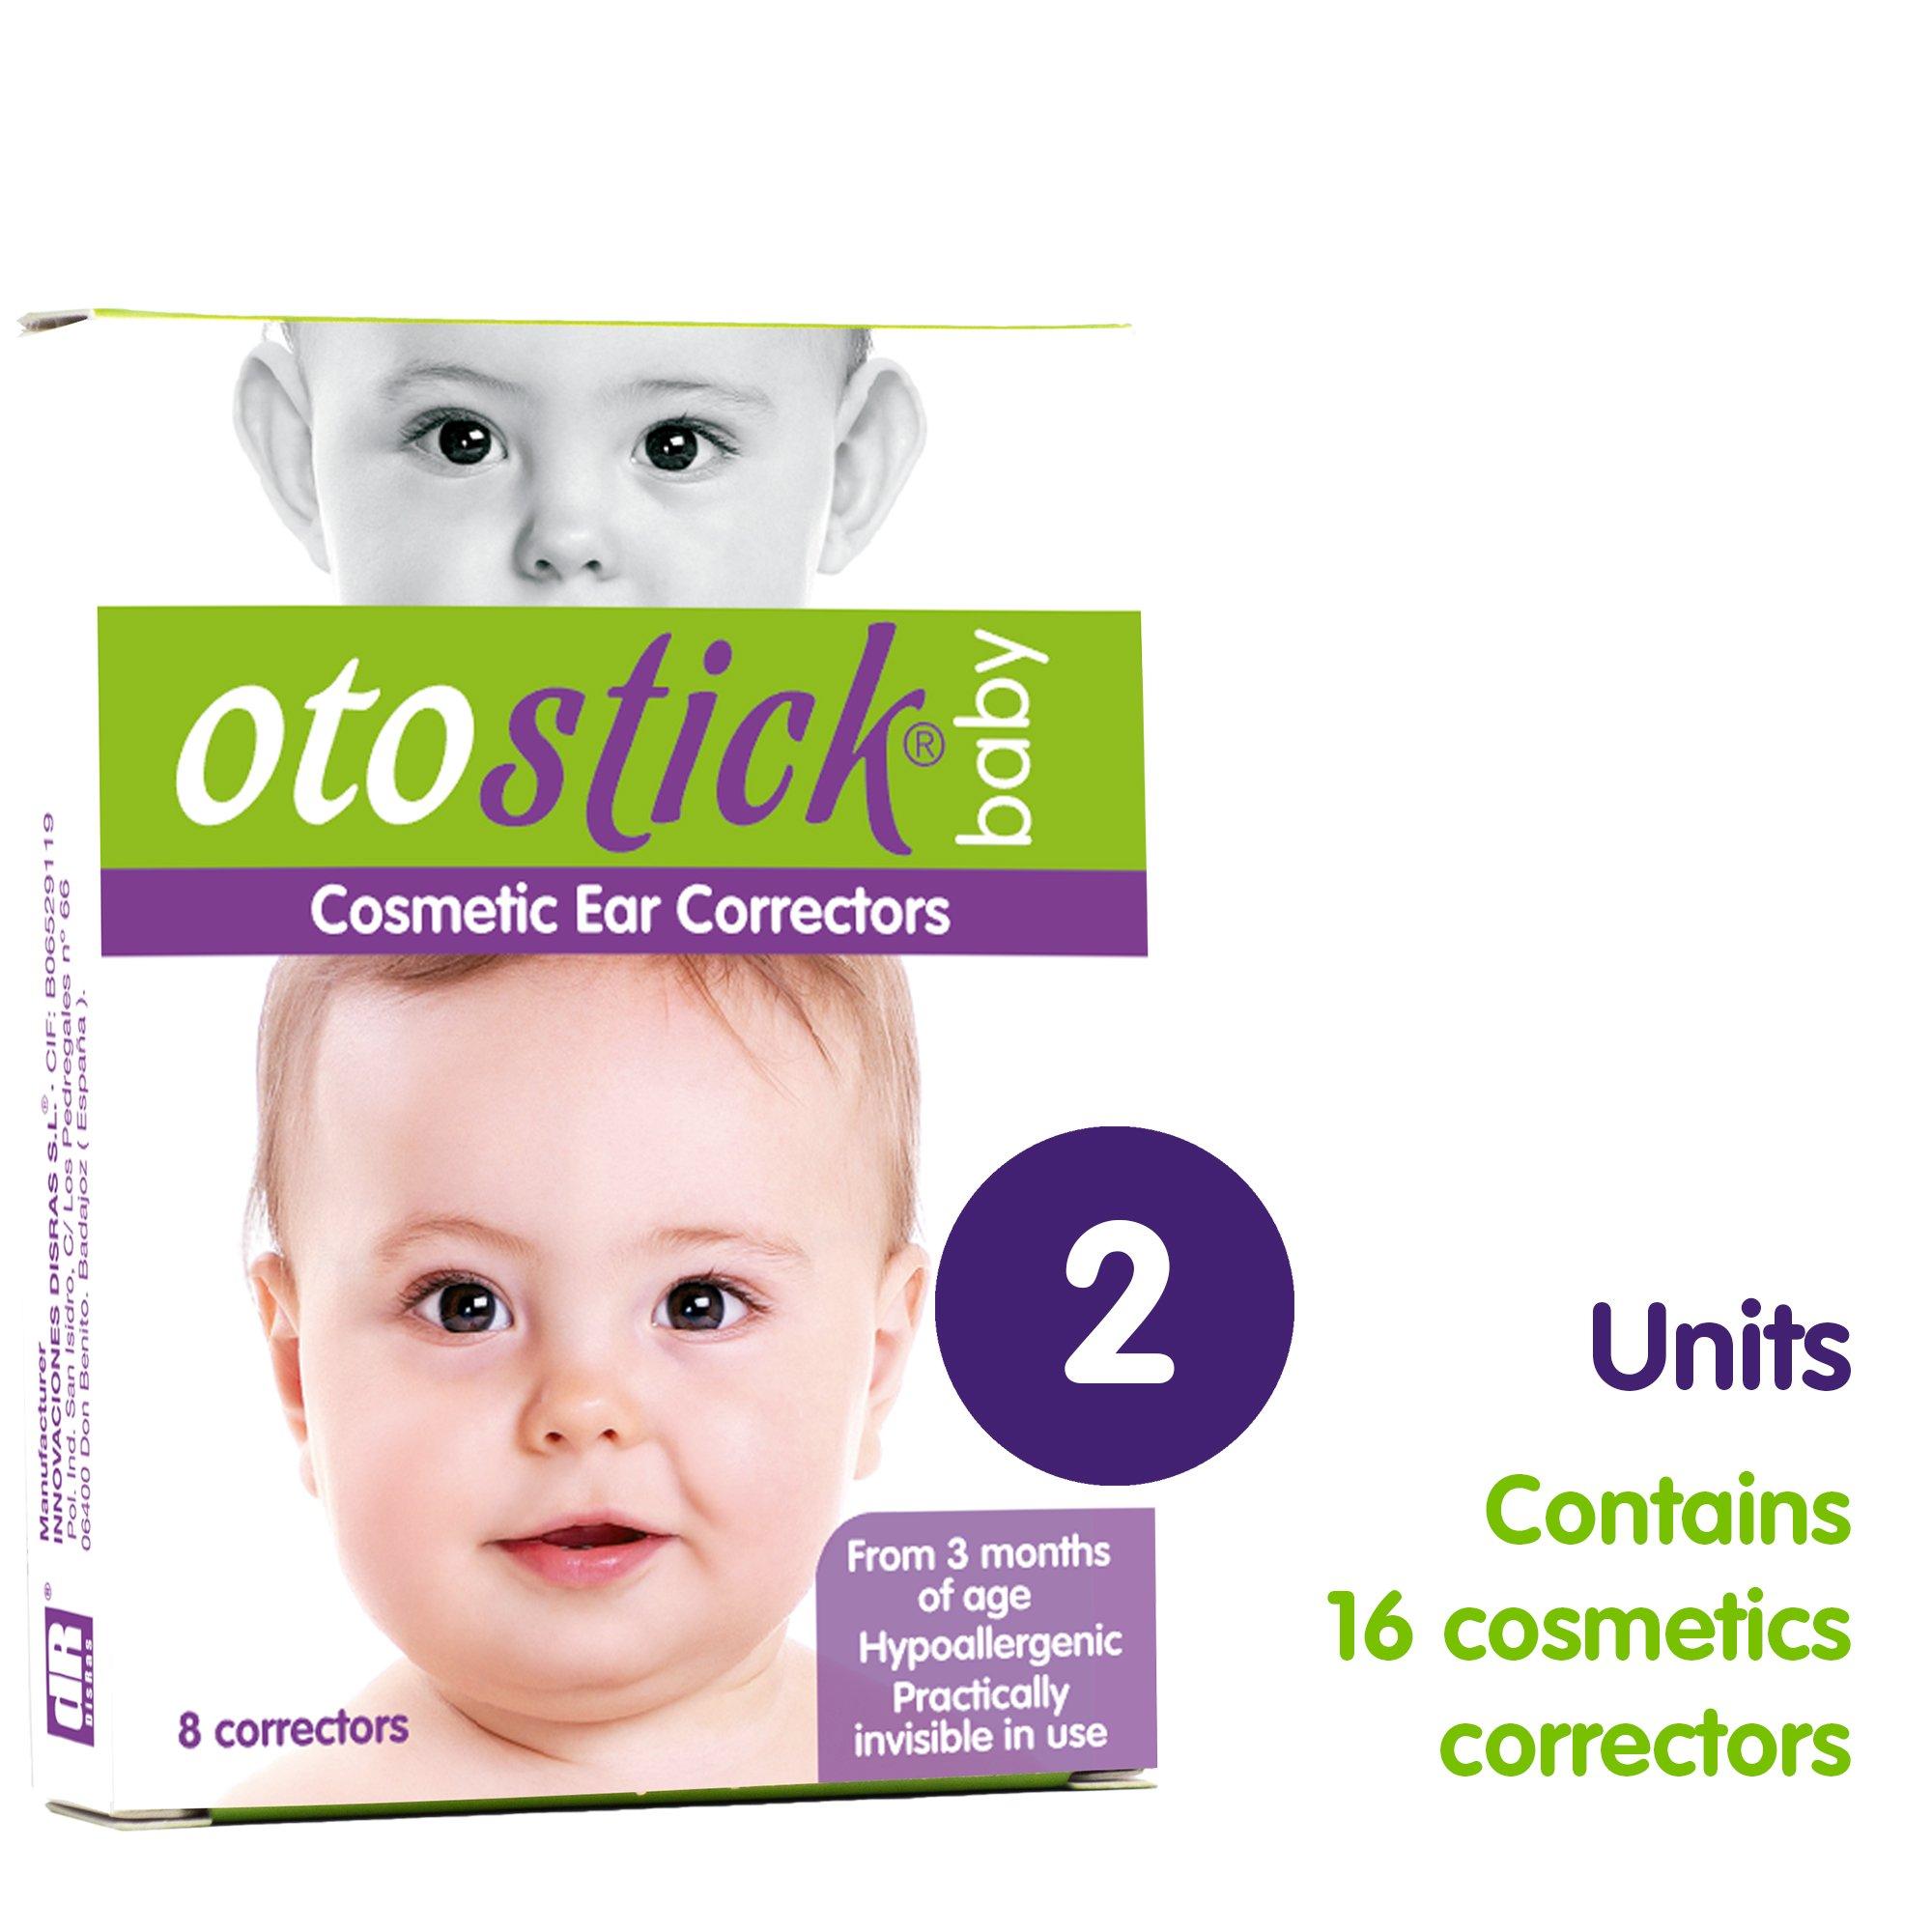 otsotick-baby-2-eng